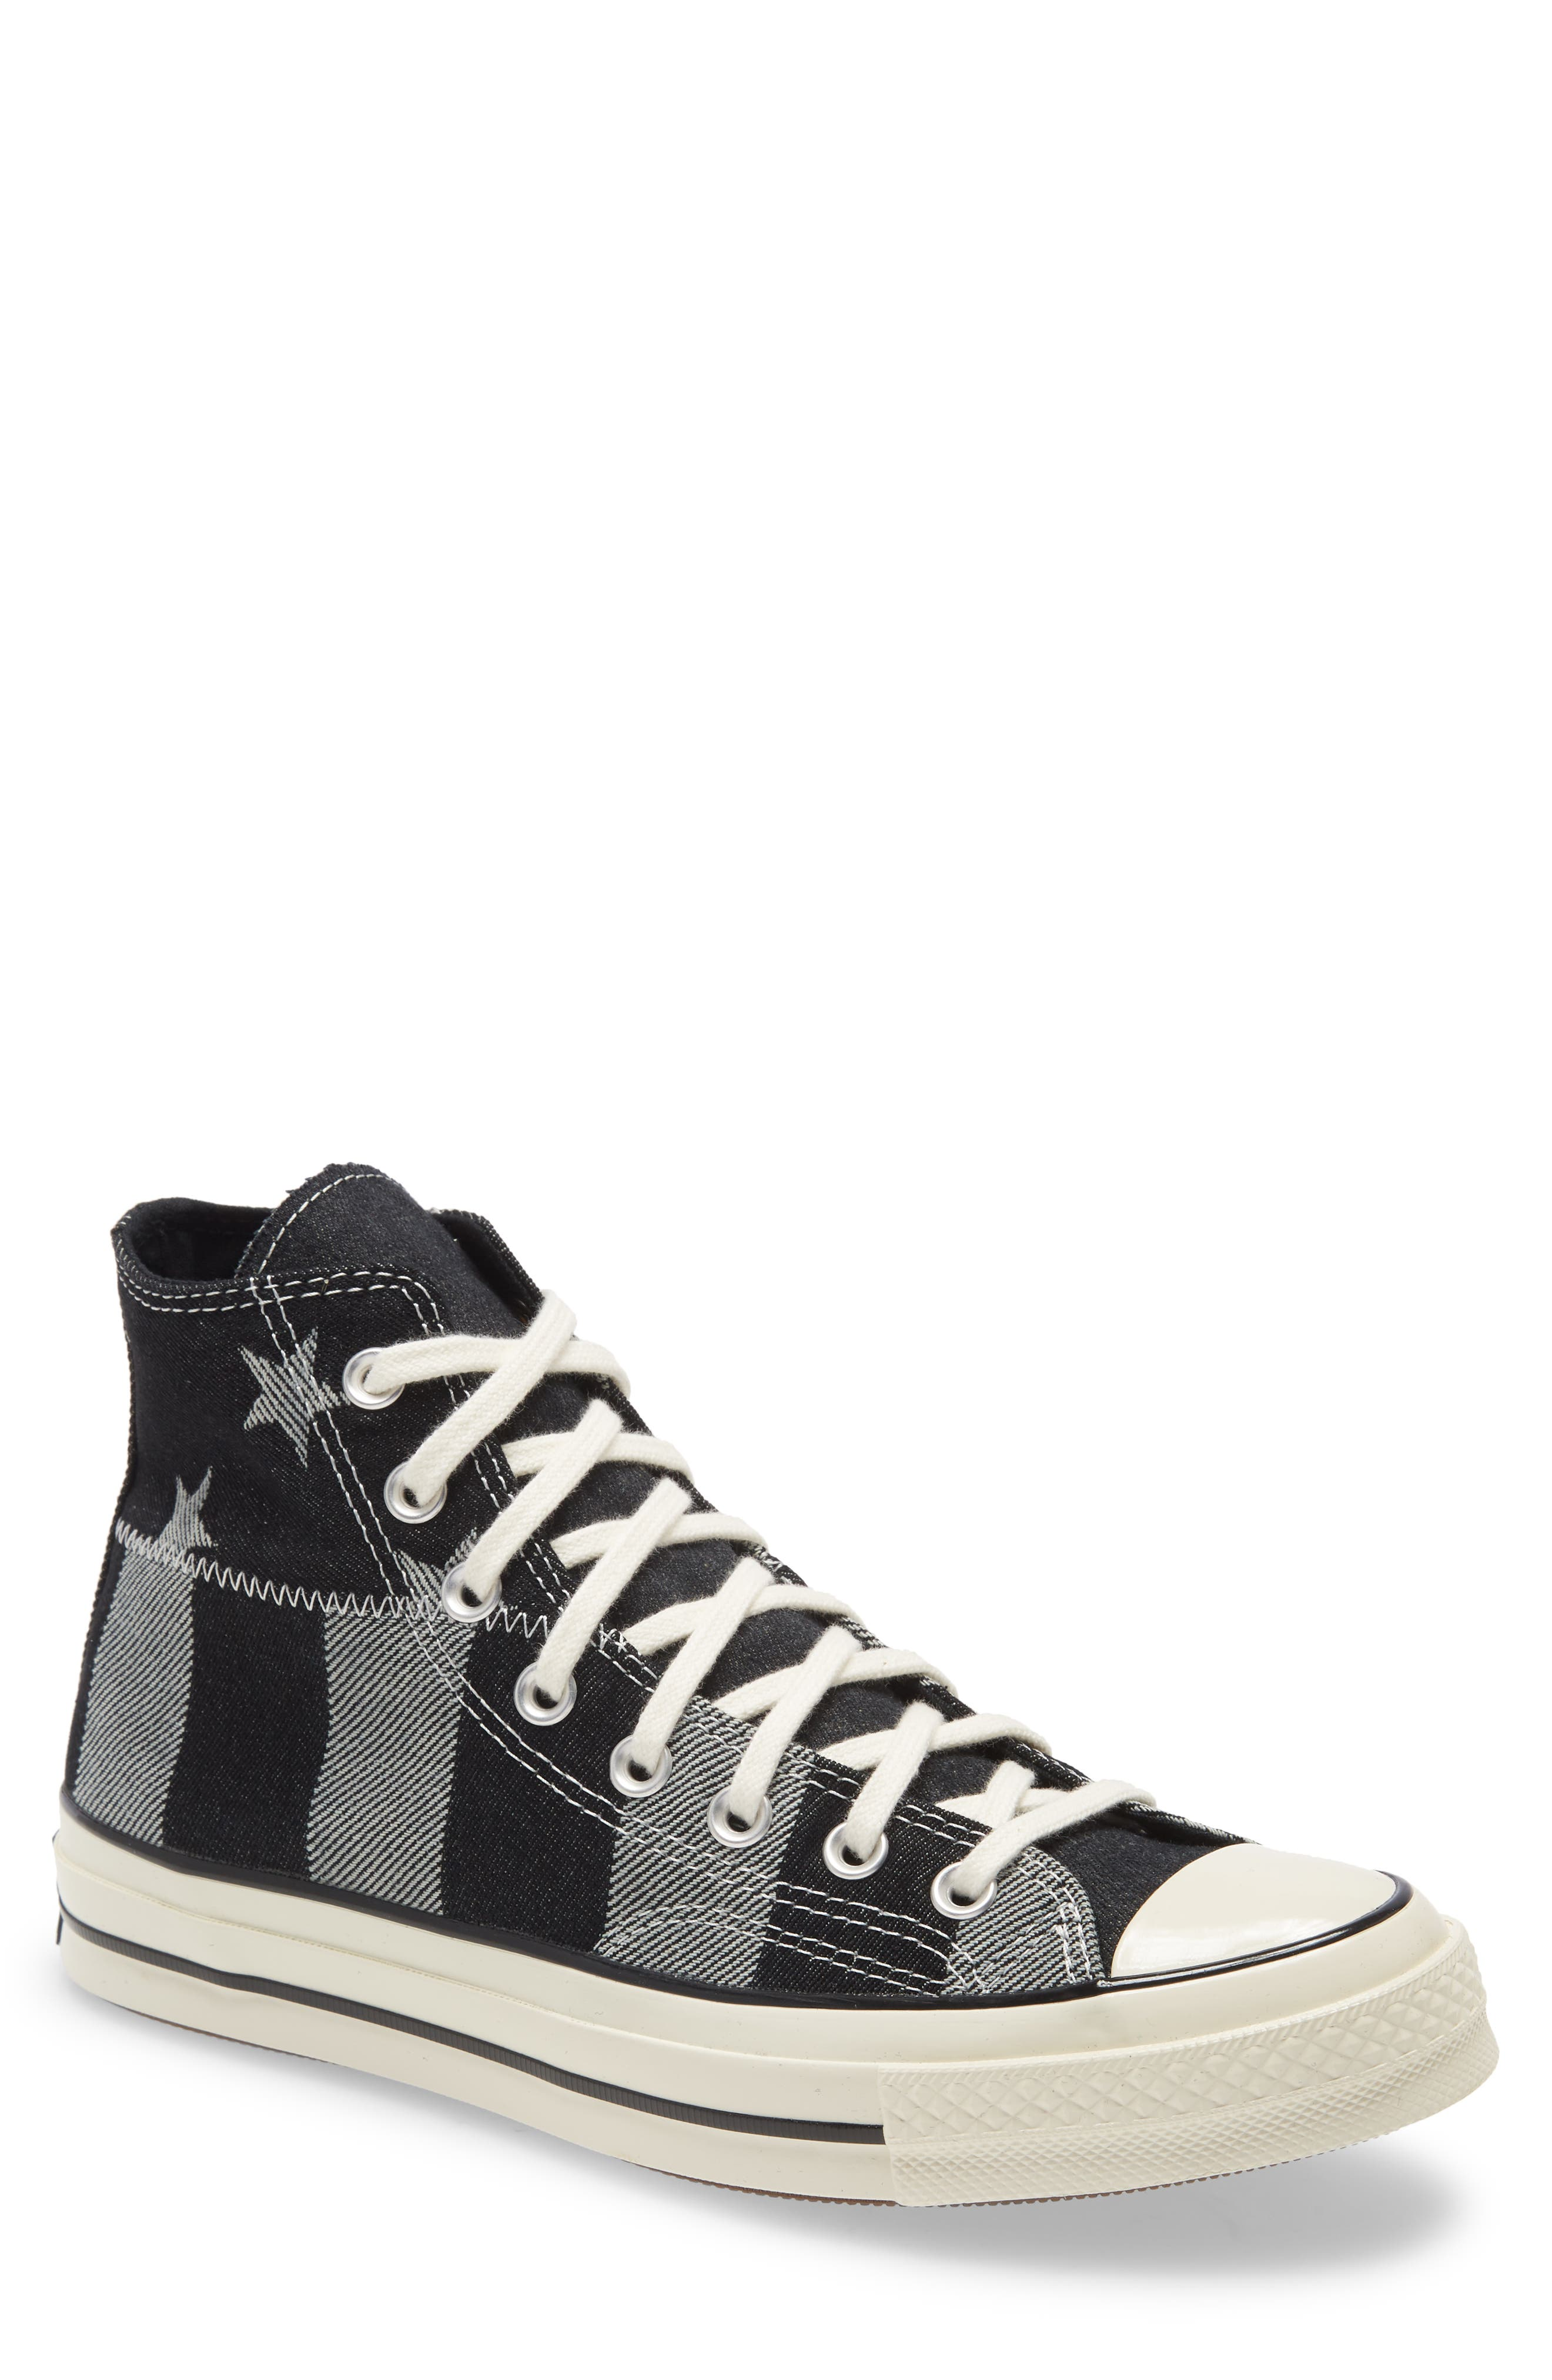 Image of Converse Chuck Taylor® All Star® Chuck 70 High Top Denim Sneaker